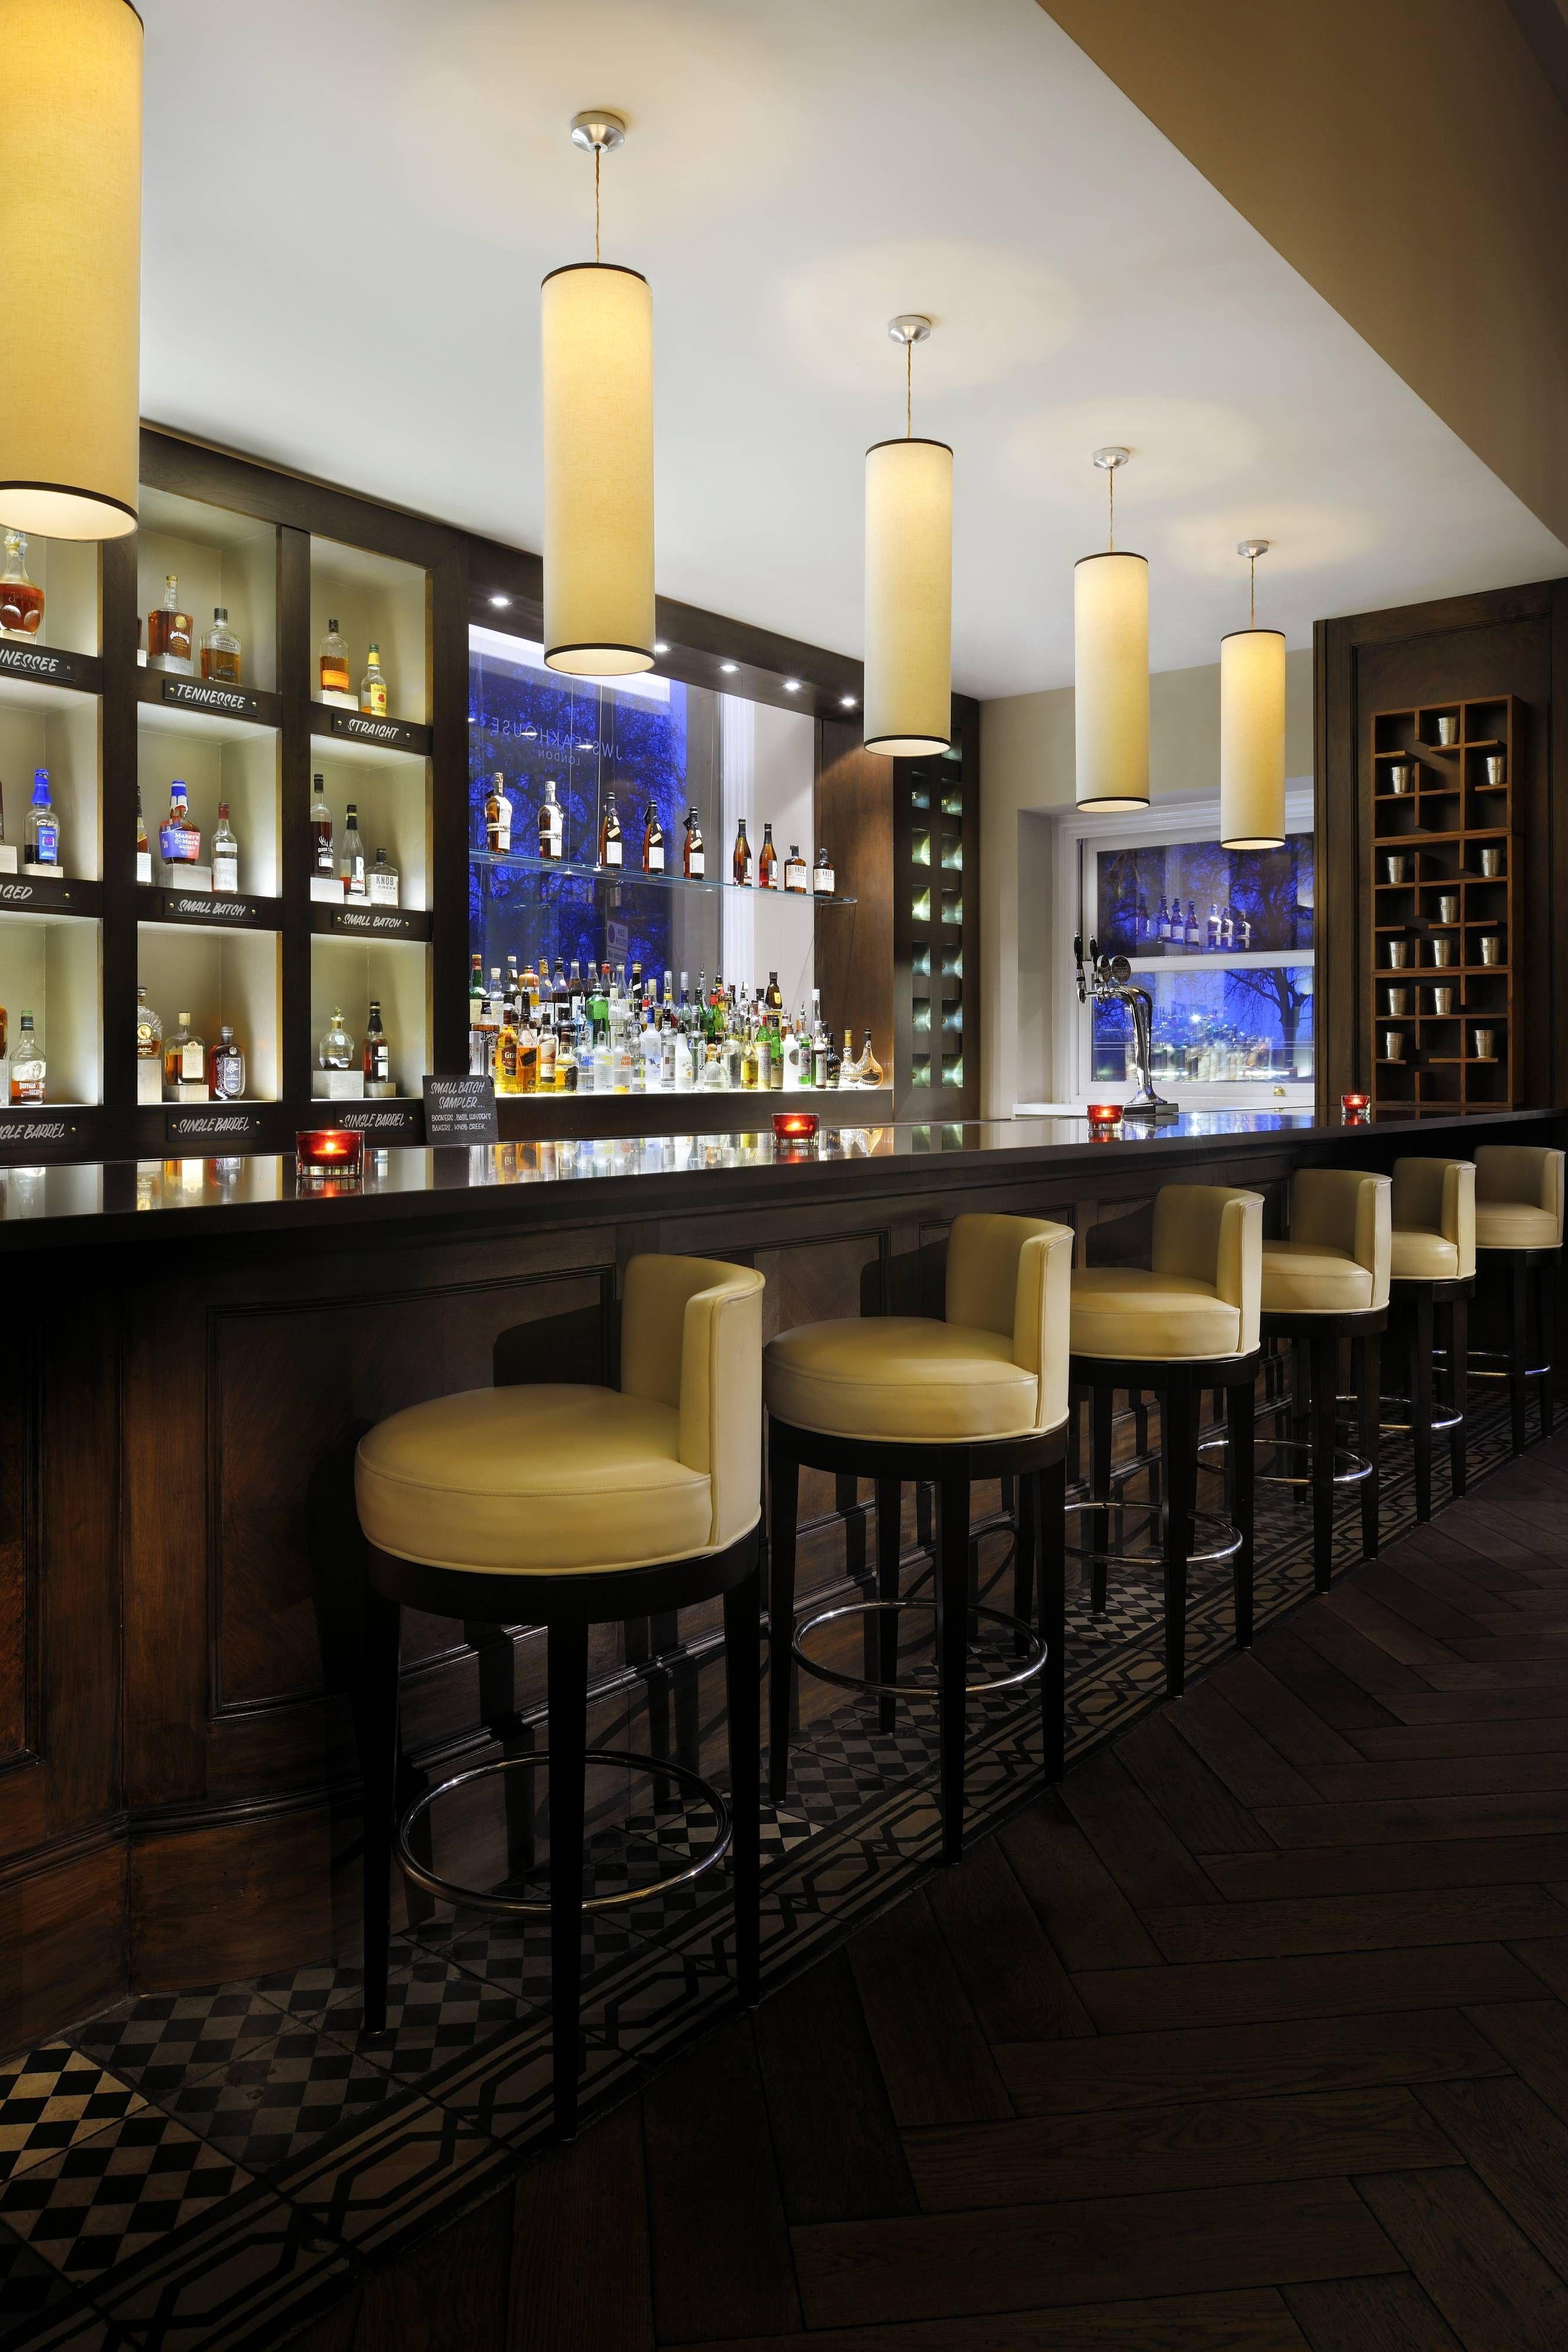 Grosvenor House A Jw Marriott Hotel The Bourbon Bar Hotels Travel Beautiful Bars For Home Marriott Hotels Restaurant Bar